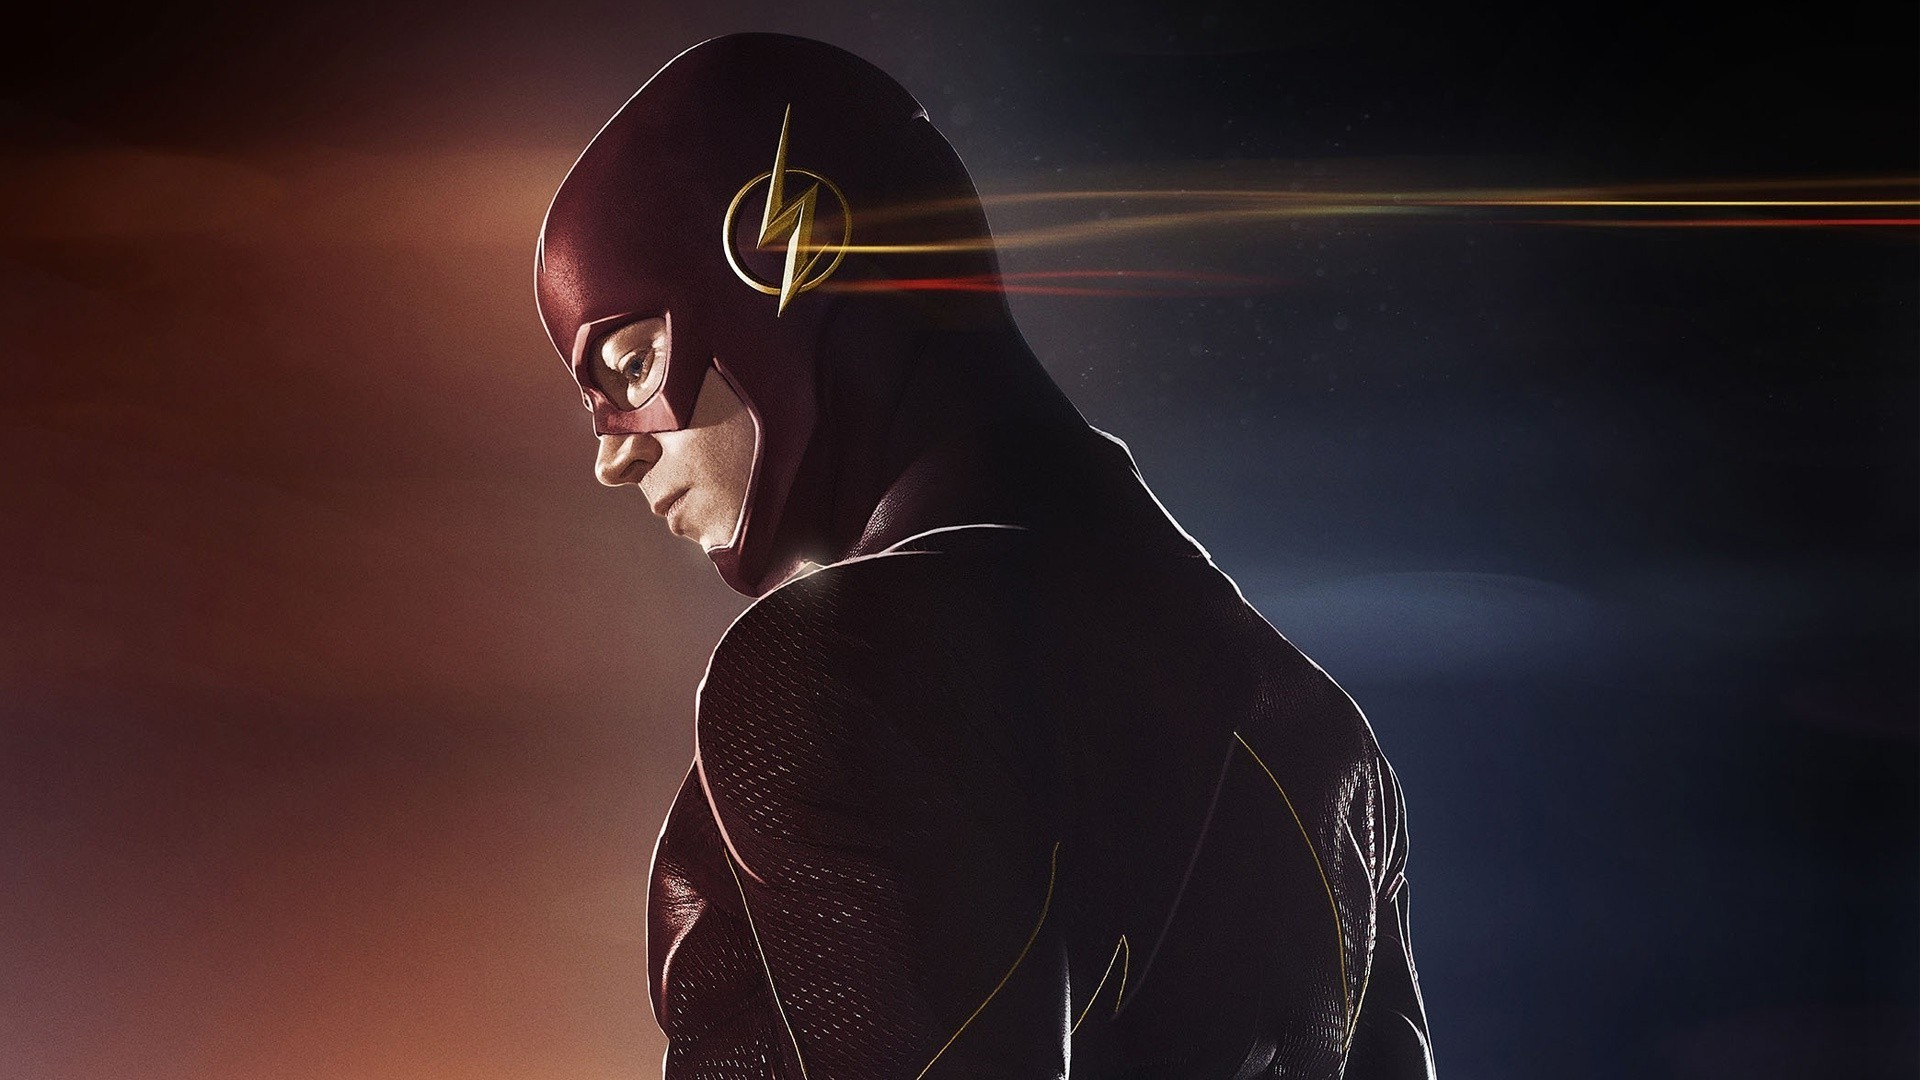 superhero wallpapers (65+ images)